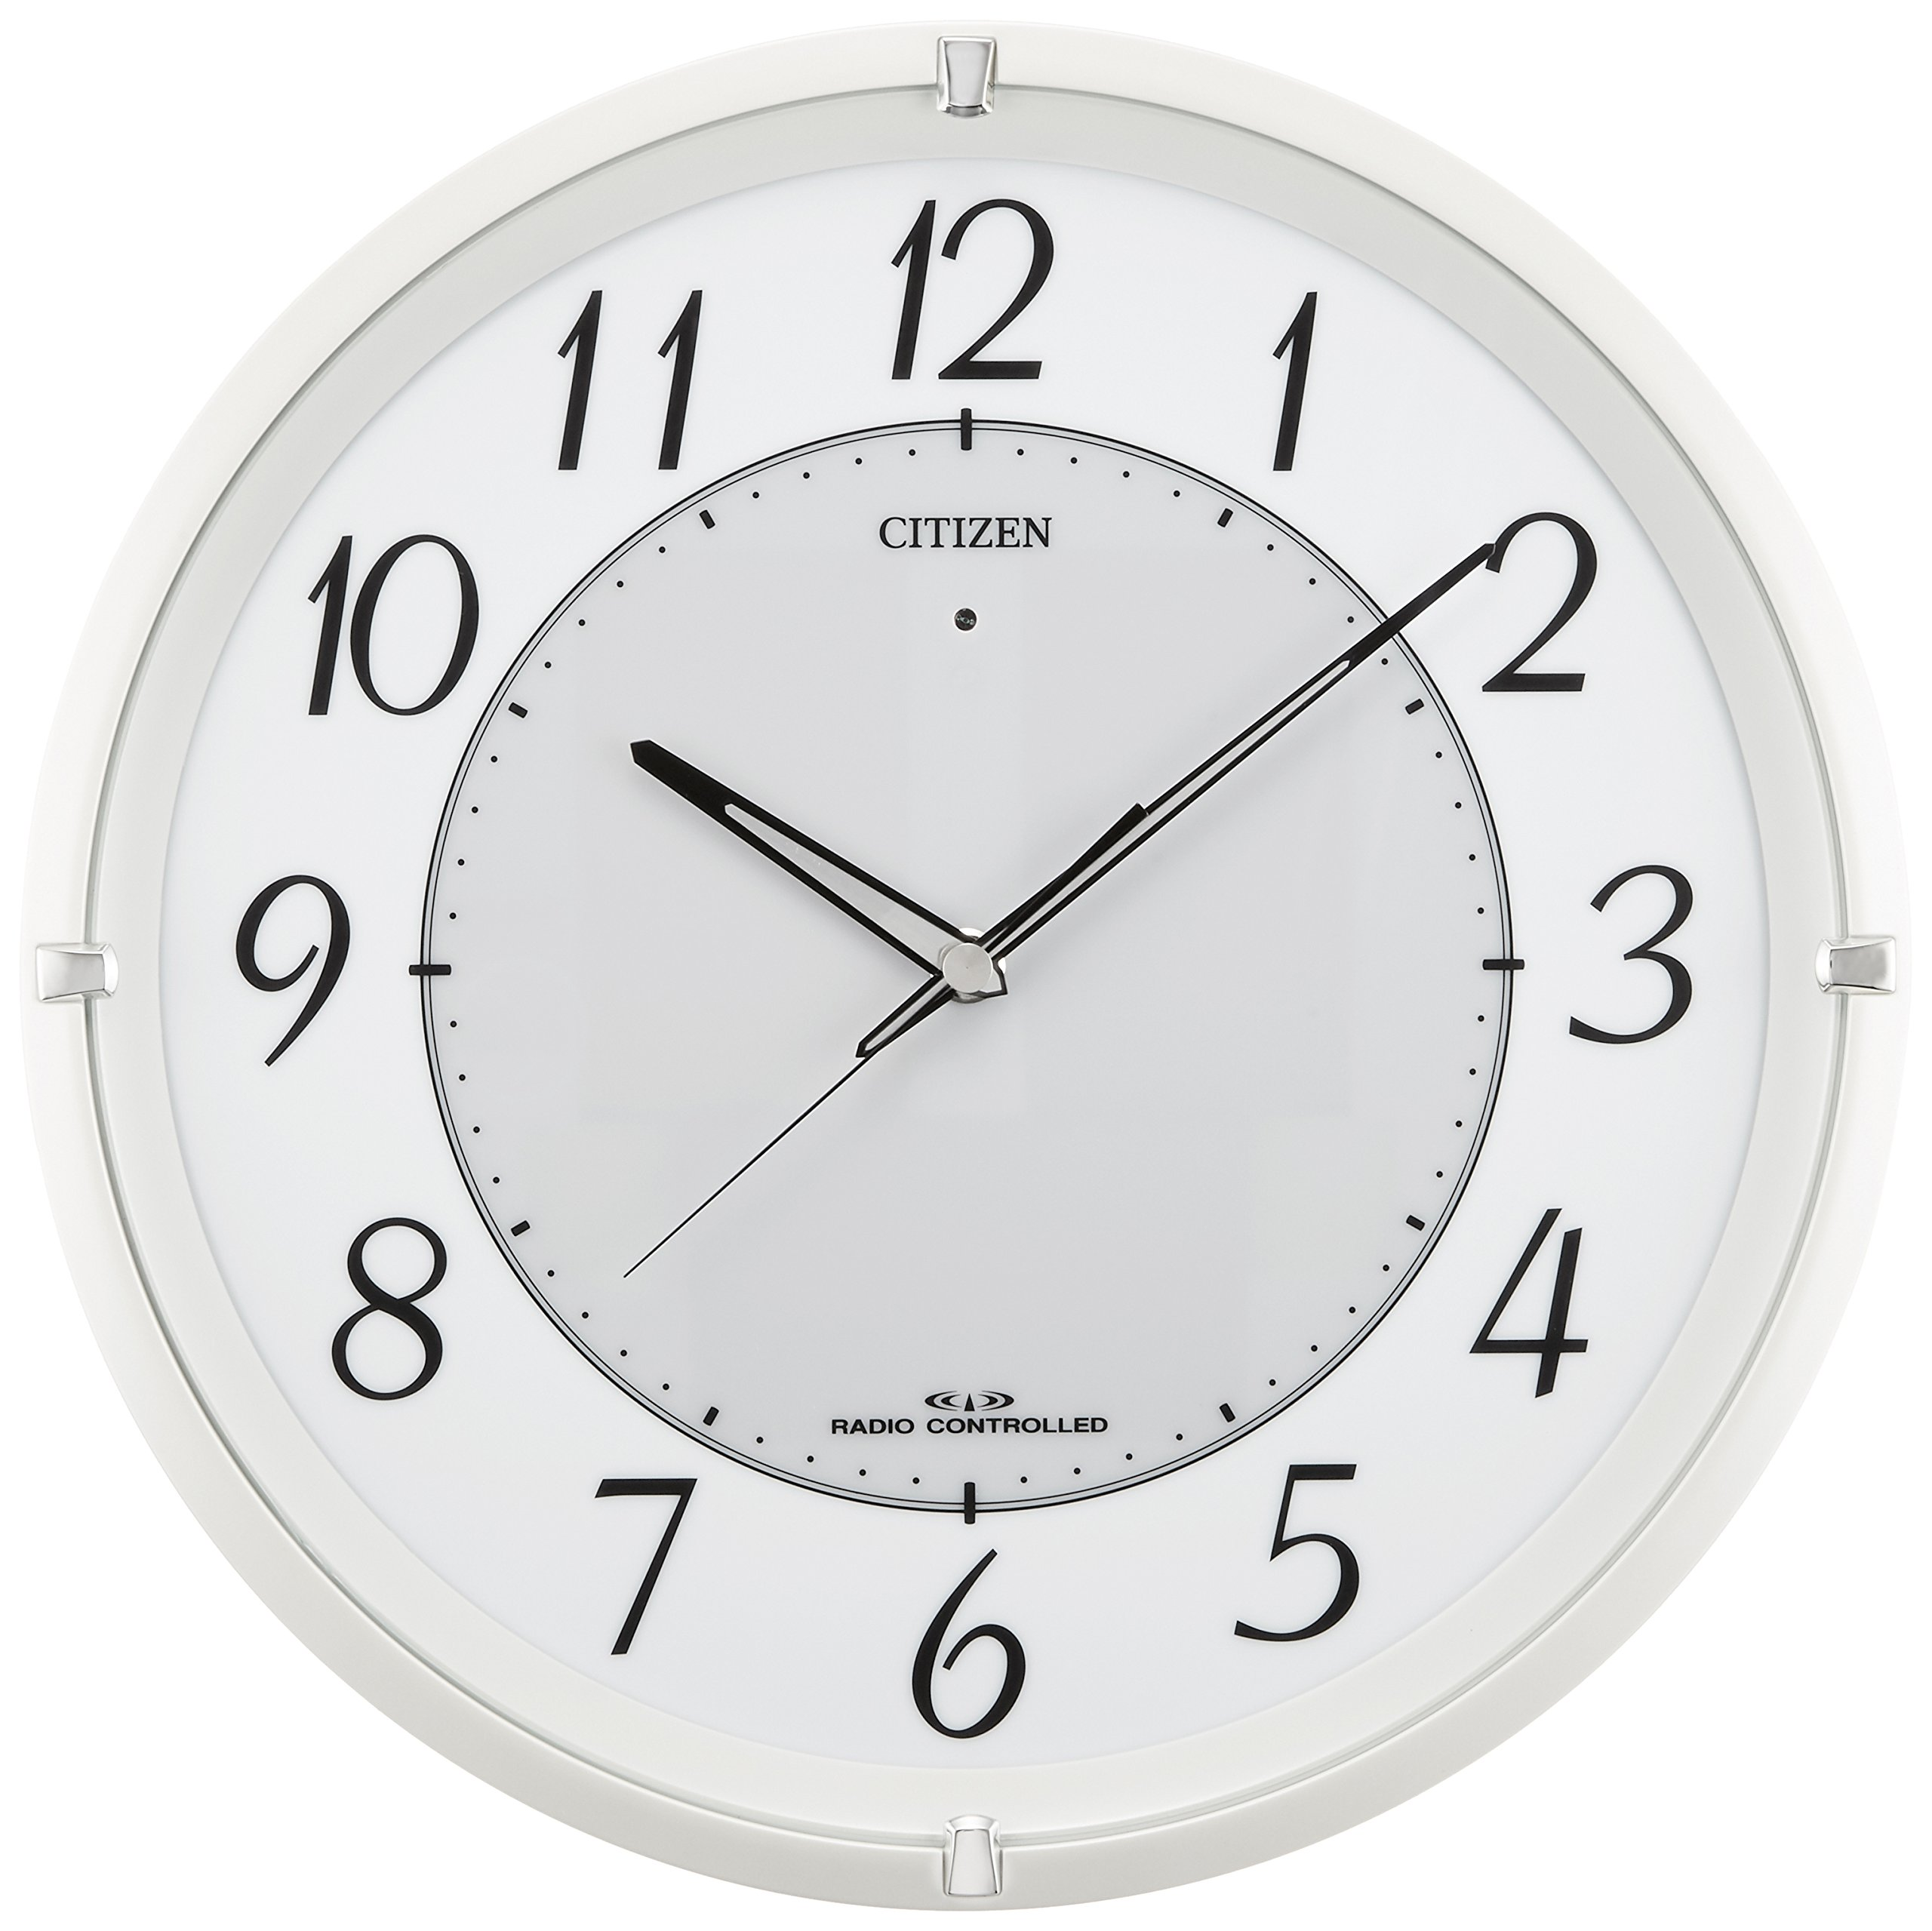 CITIZEN ( Citizen ) wall clock Eco Life M788 solar power radio clock hybrid type 4MY788-003